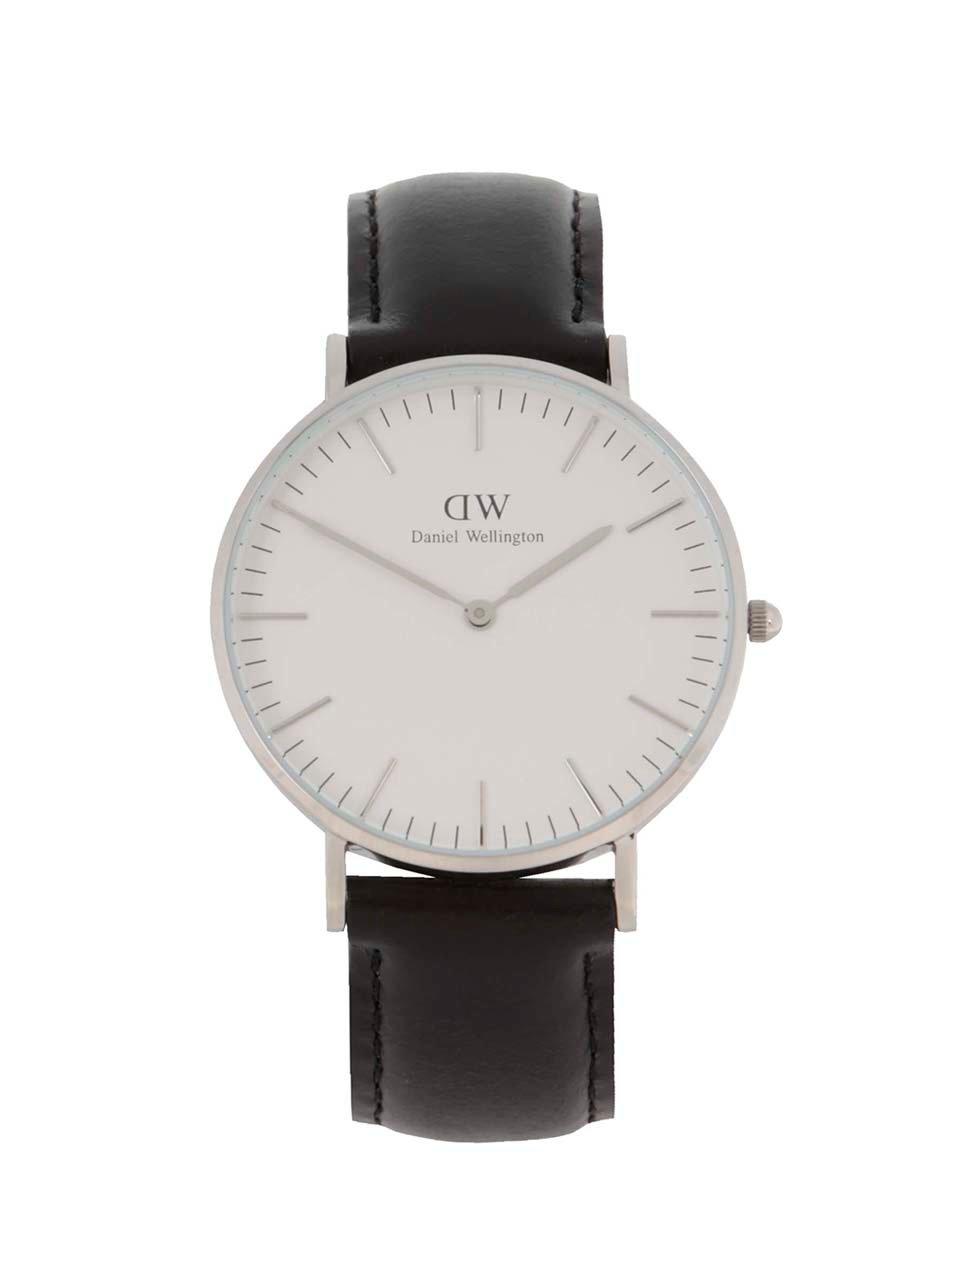 Dámske hodinky v striebornej farbe CLASSIC Sheffield Daniel Wellington 3dd1b085887